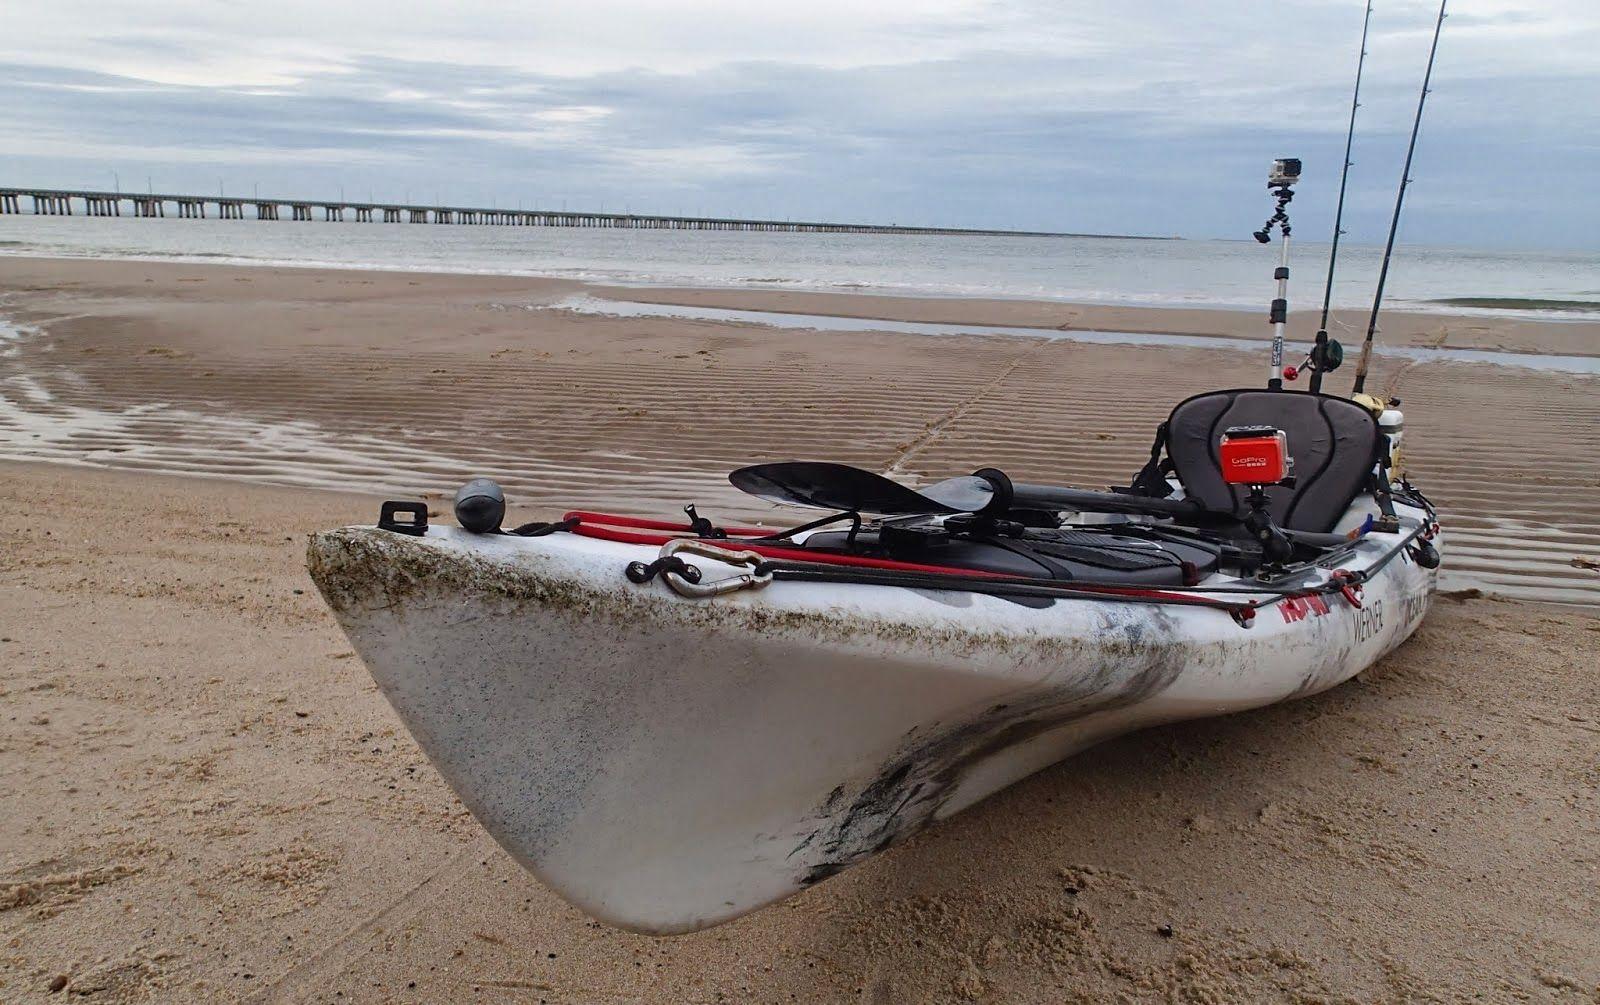 Angling addict ocean kayak trident 13 review fishing for Ocean kayak fishing